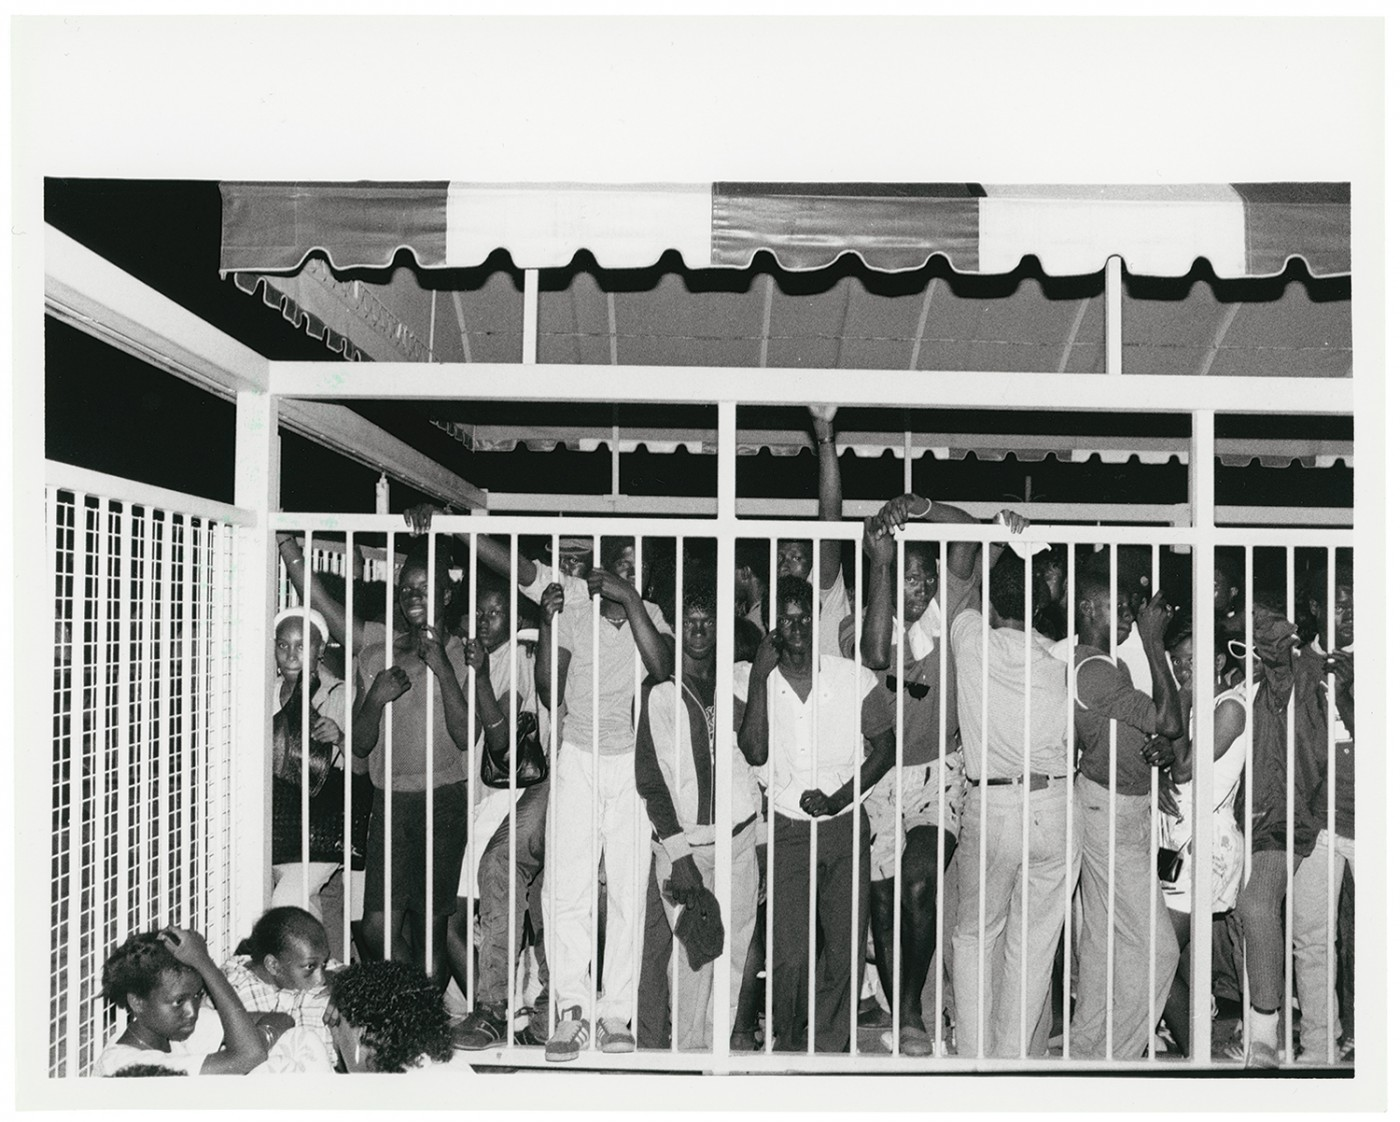 Al Peabody, </span><span><em>Not Soweto</em>, </span><span>1985. Silver gelatin print, 8x10&quot;. © Al Peabody